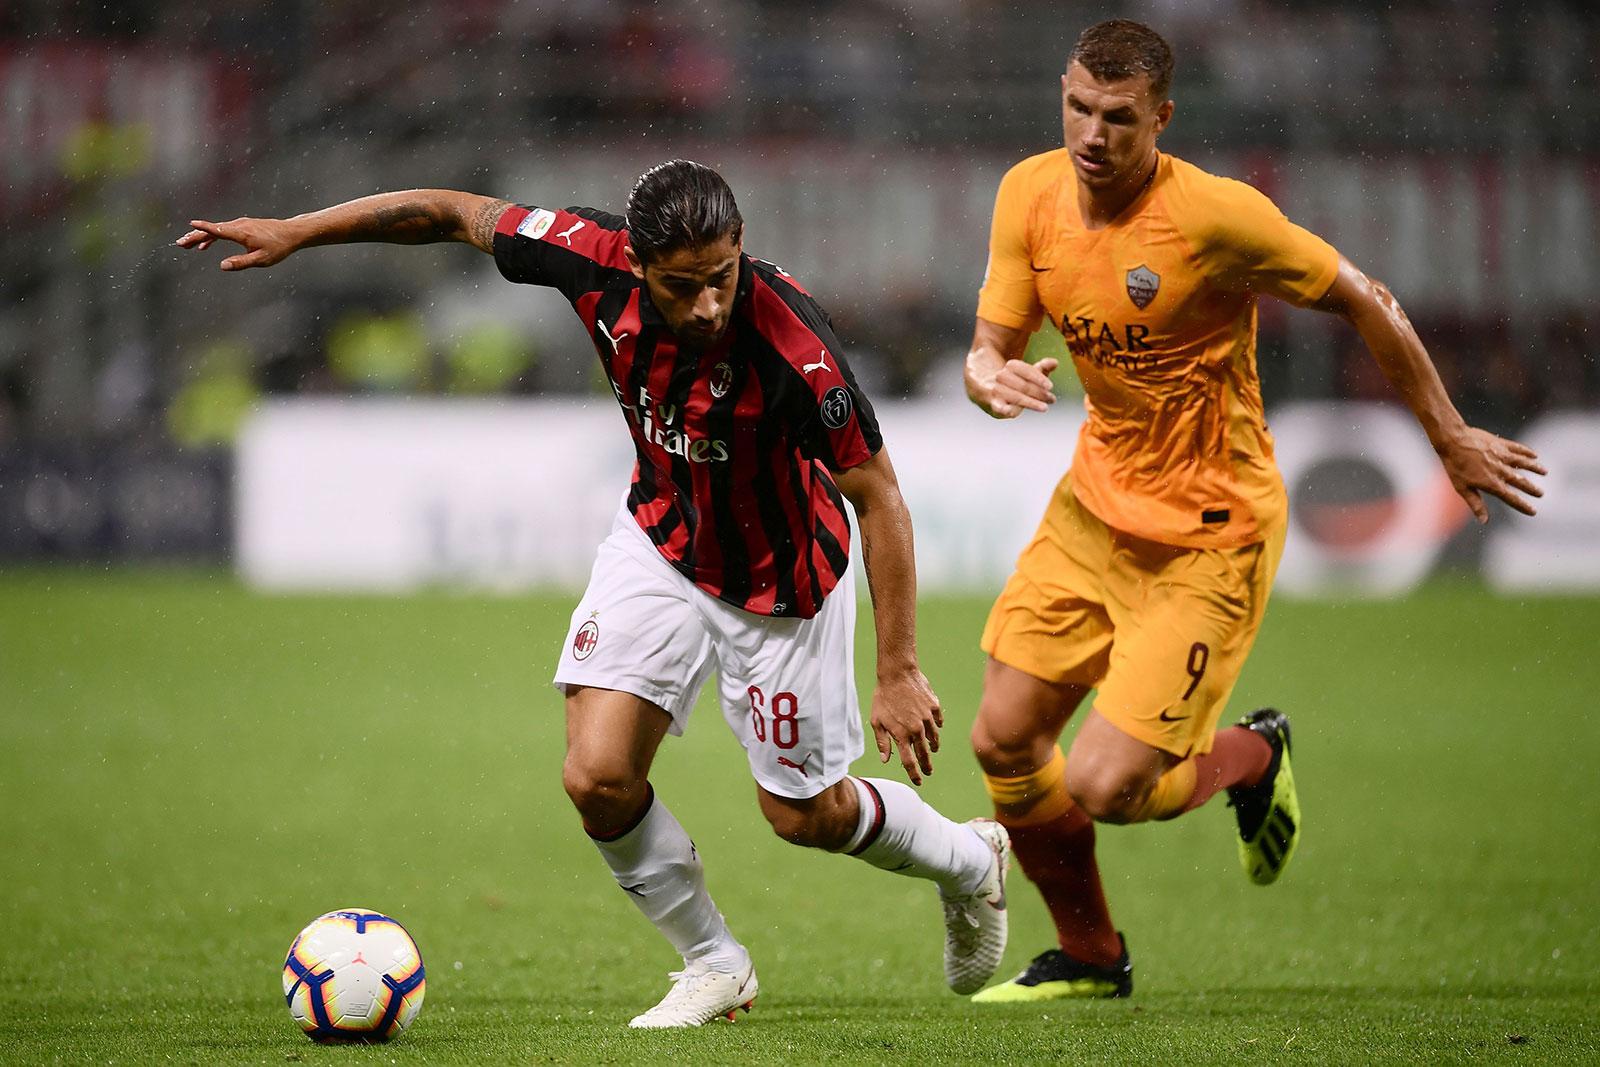 Ricardo Rodriguez and Edin Džeko during Milan-Roma at Stadio San Siro on August 31, 2018. (MARCO BERTORELLO/AFP/Getty Images)